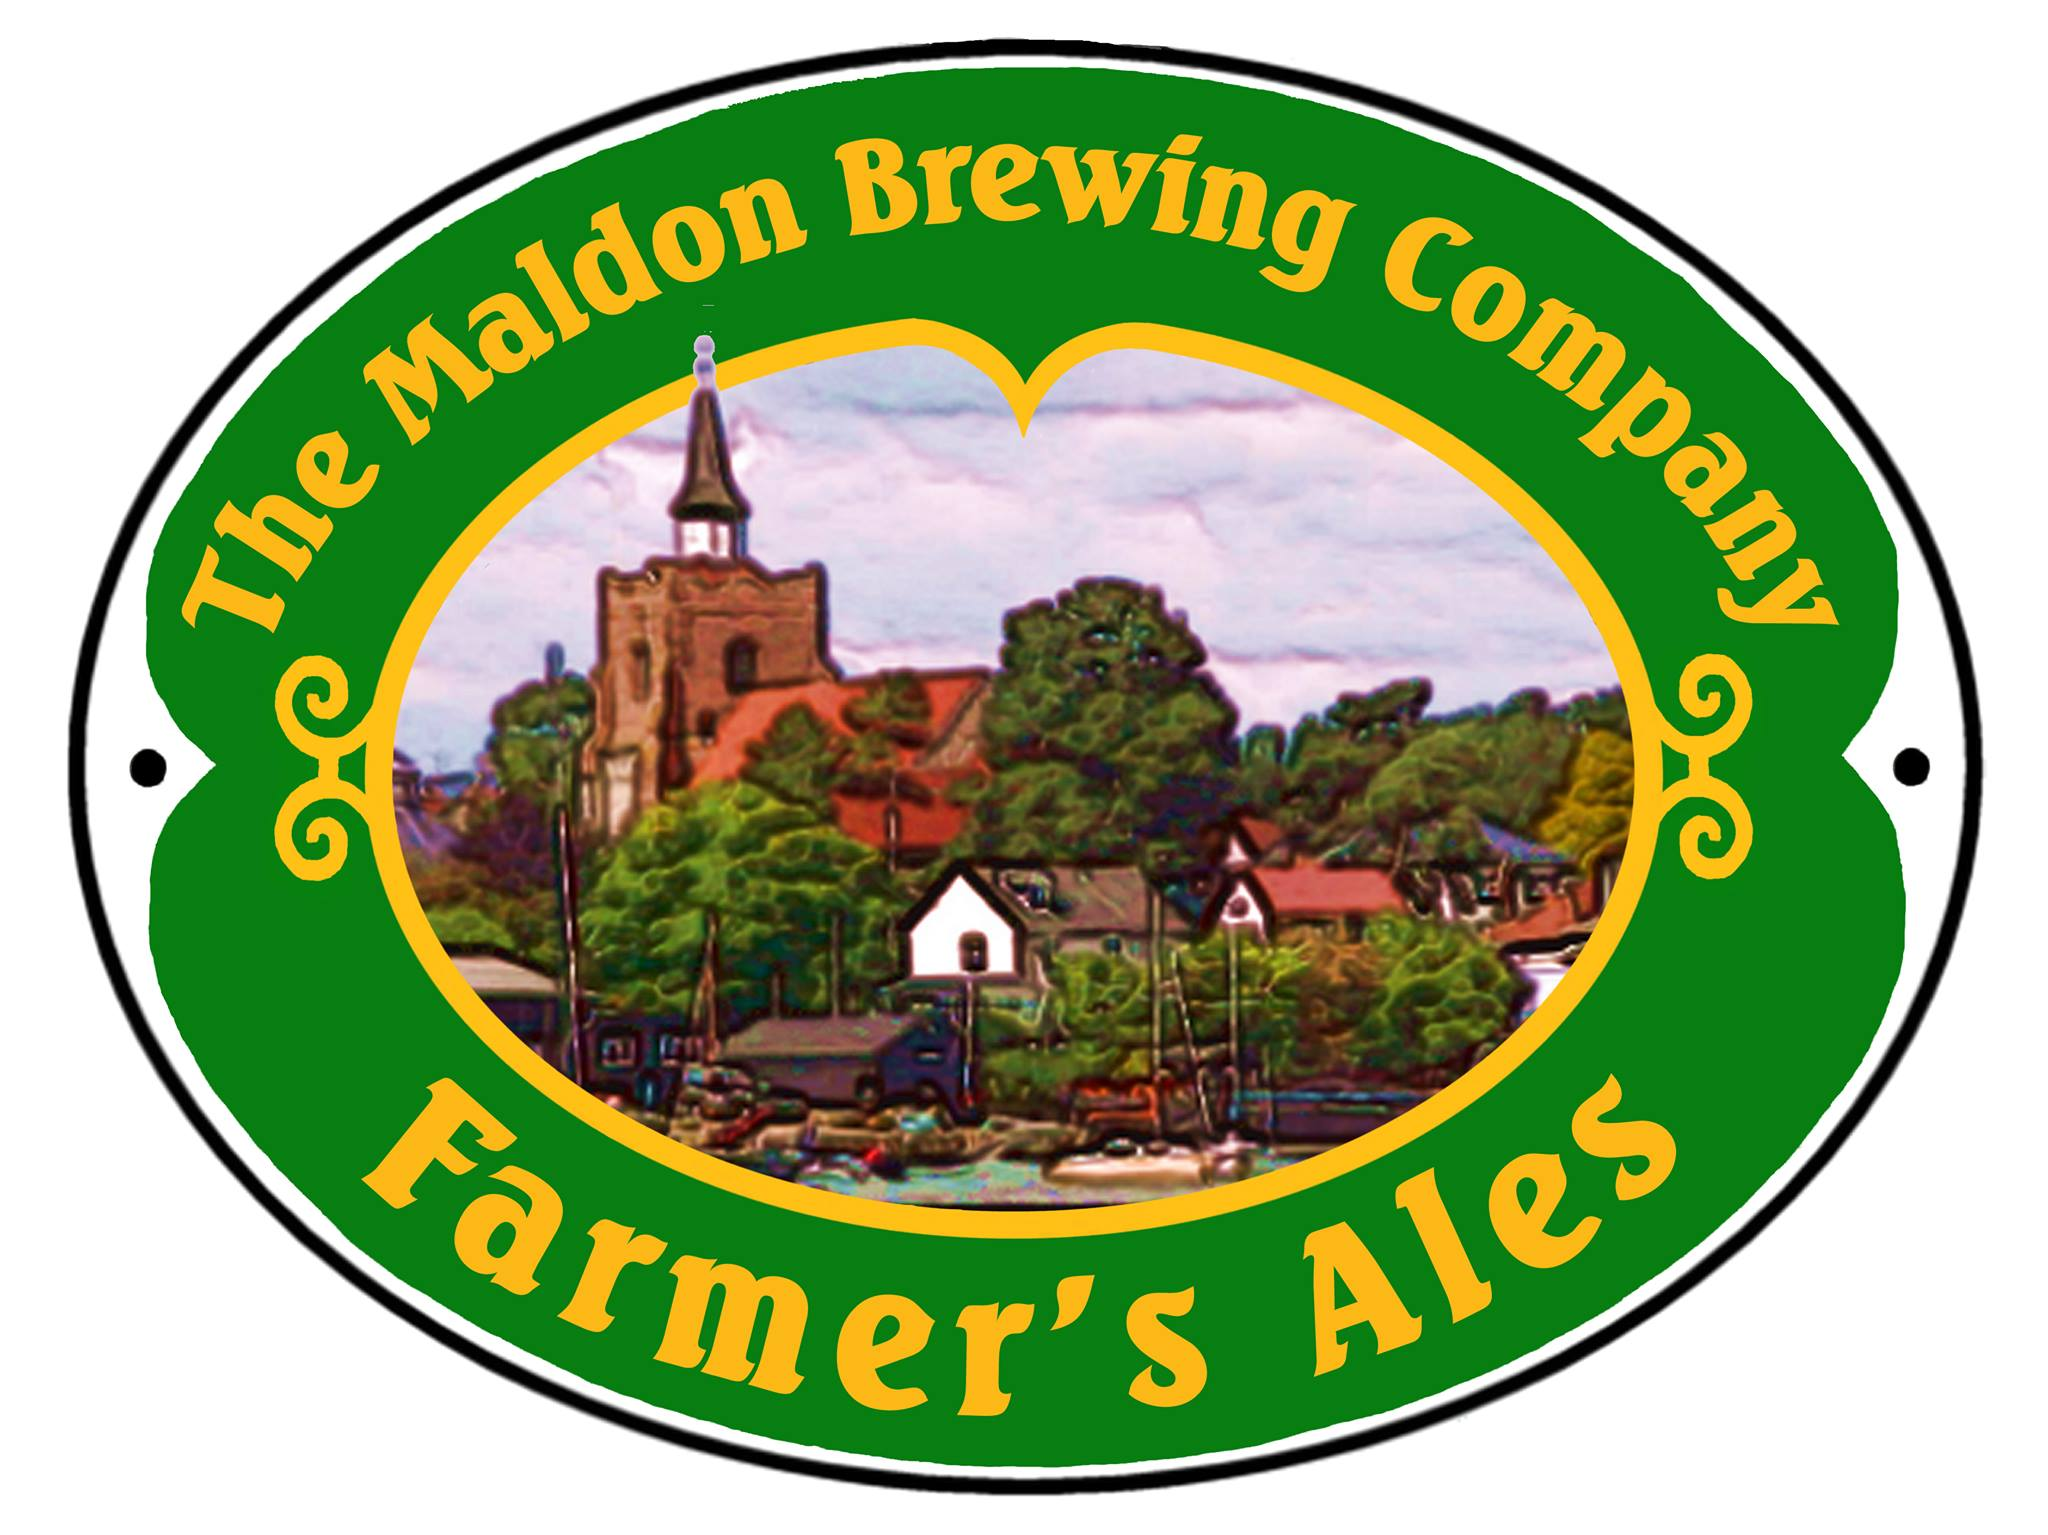 Maldon Brewing Company